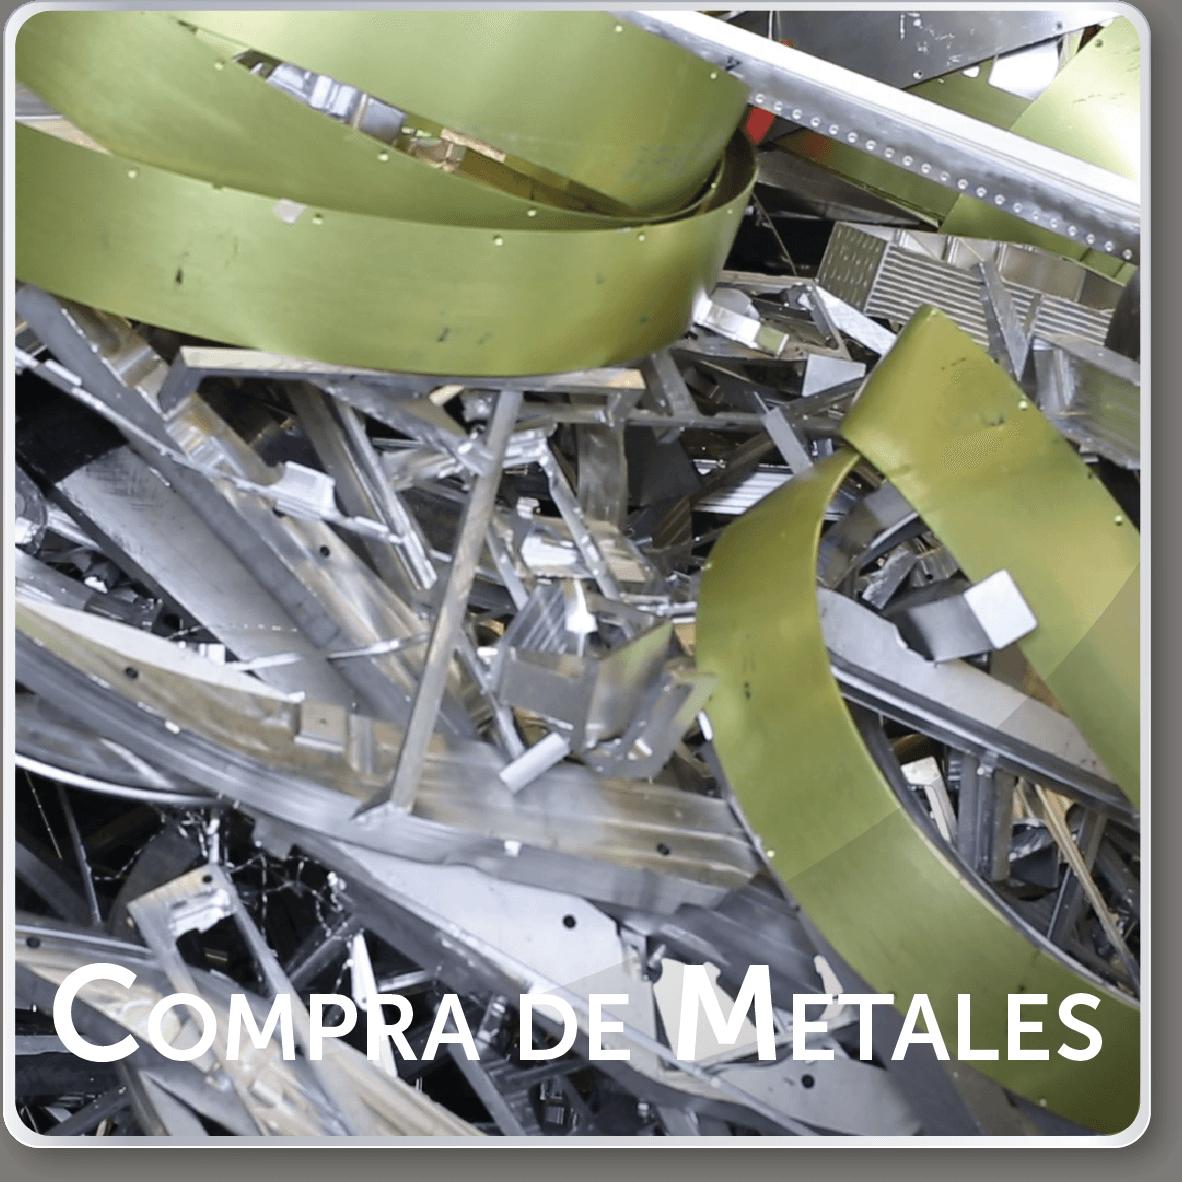 compra de metales